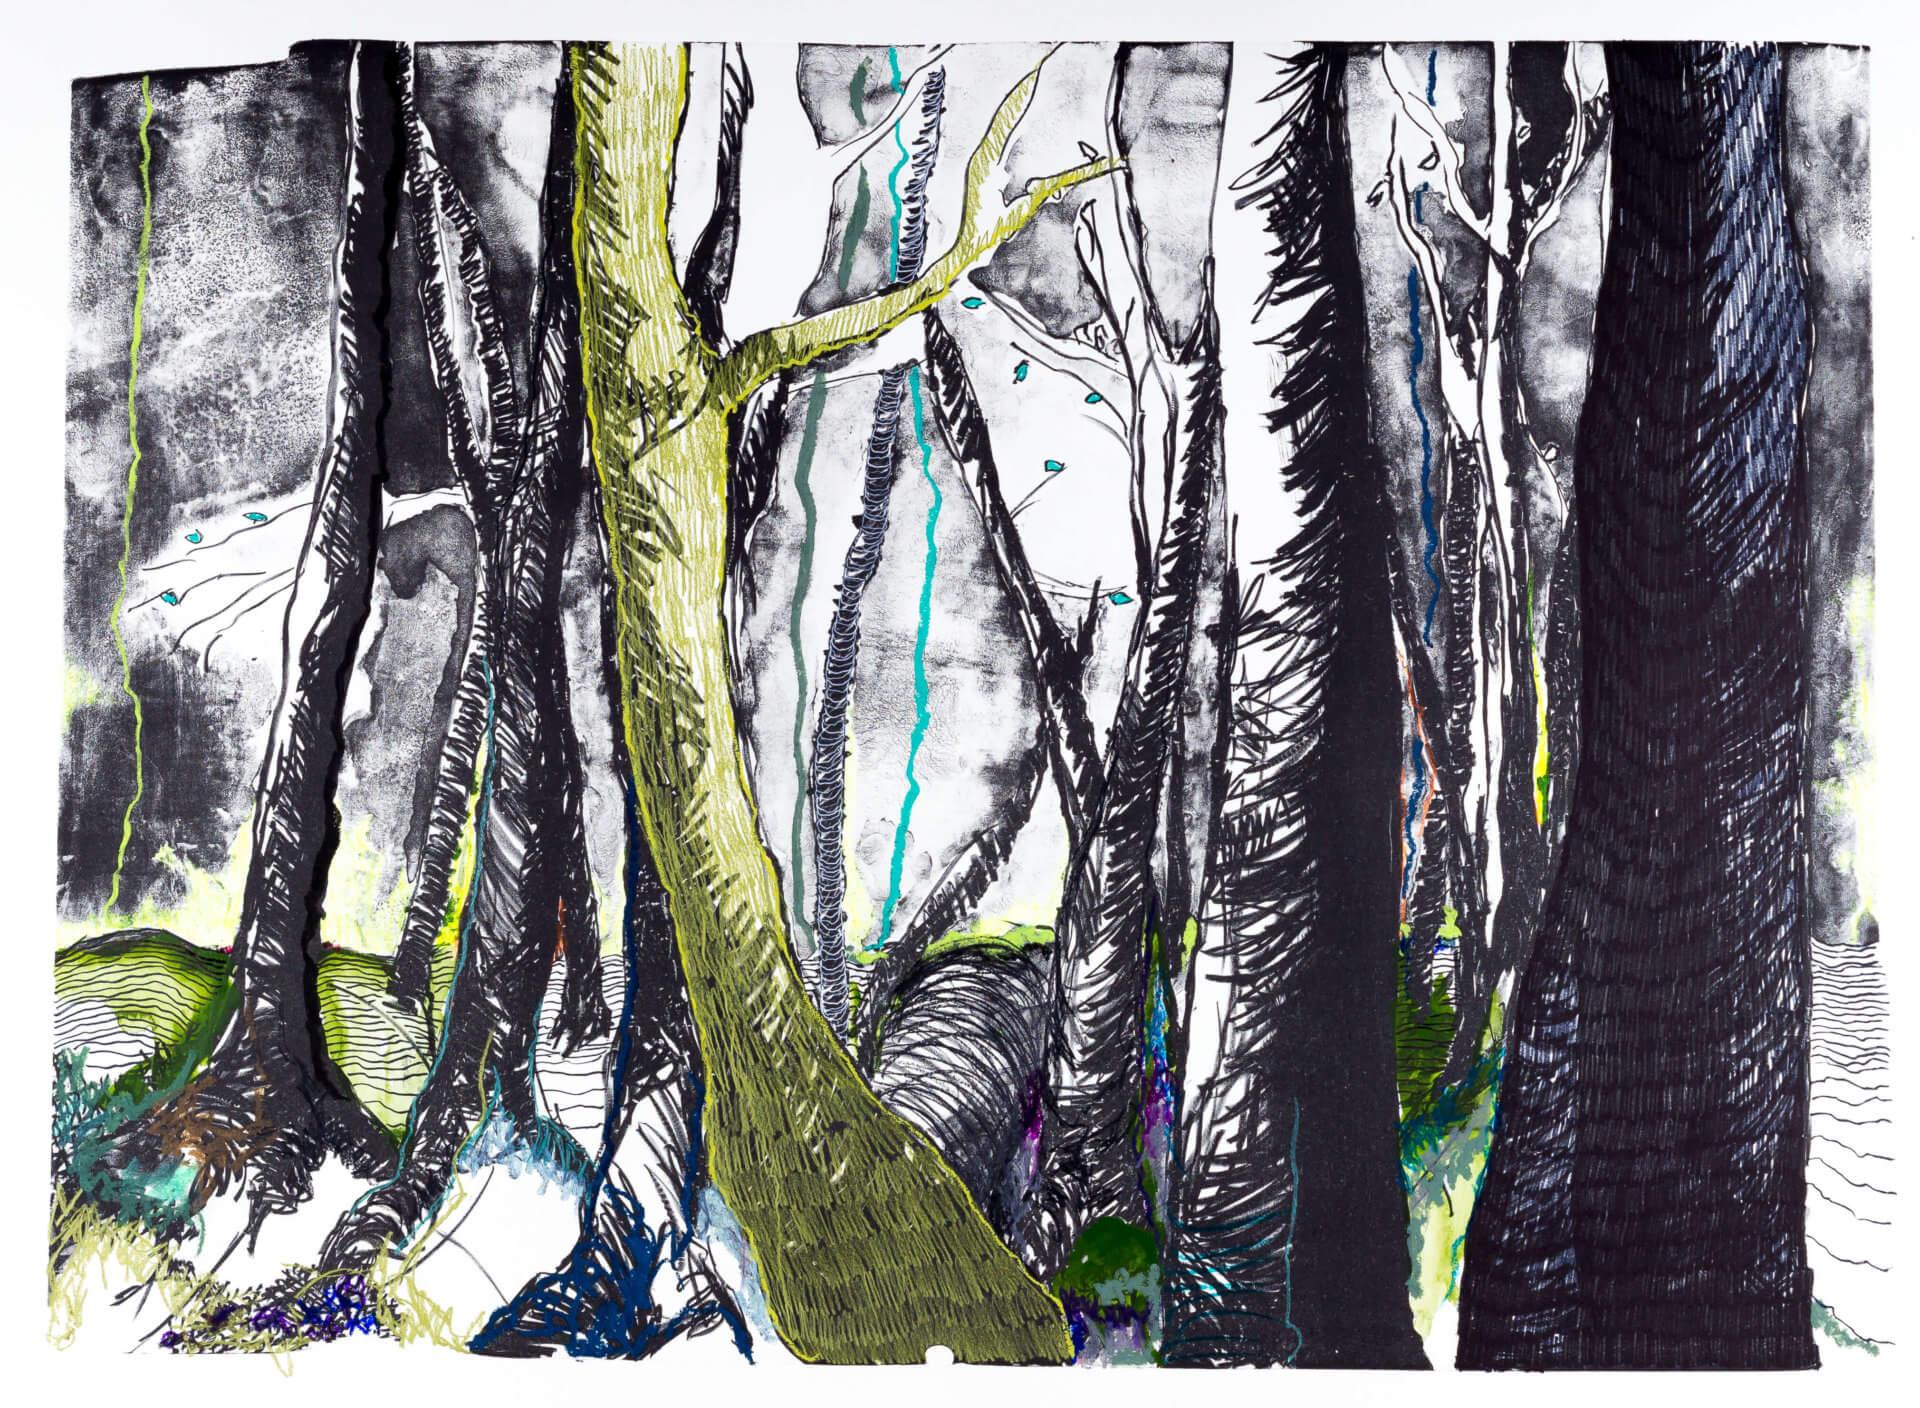 Katharina Albers, Wald (F_A)(D), 2015, Lithographie handkoloriert (Ölkreide, Graphit, Aquarellfarbe, Fineliner), Unikat, 70×100 cm